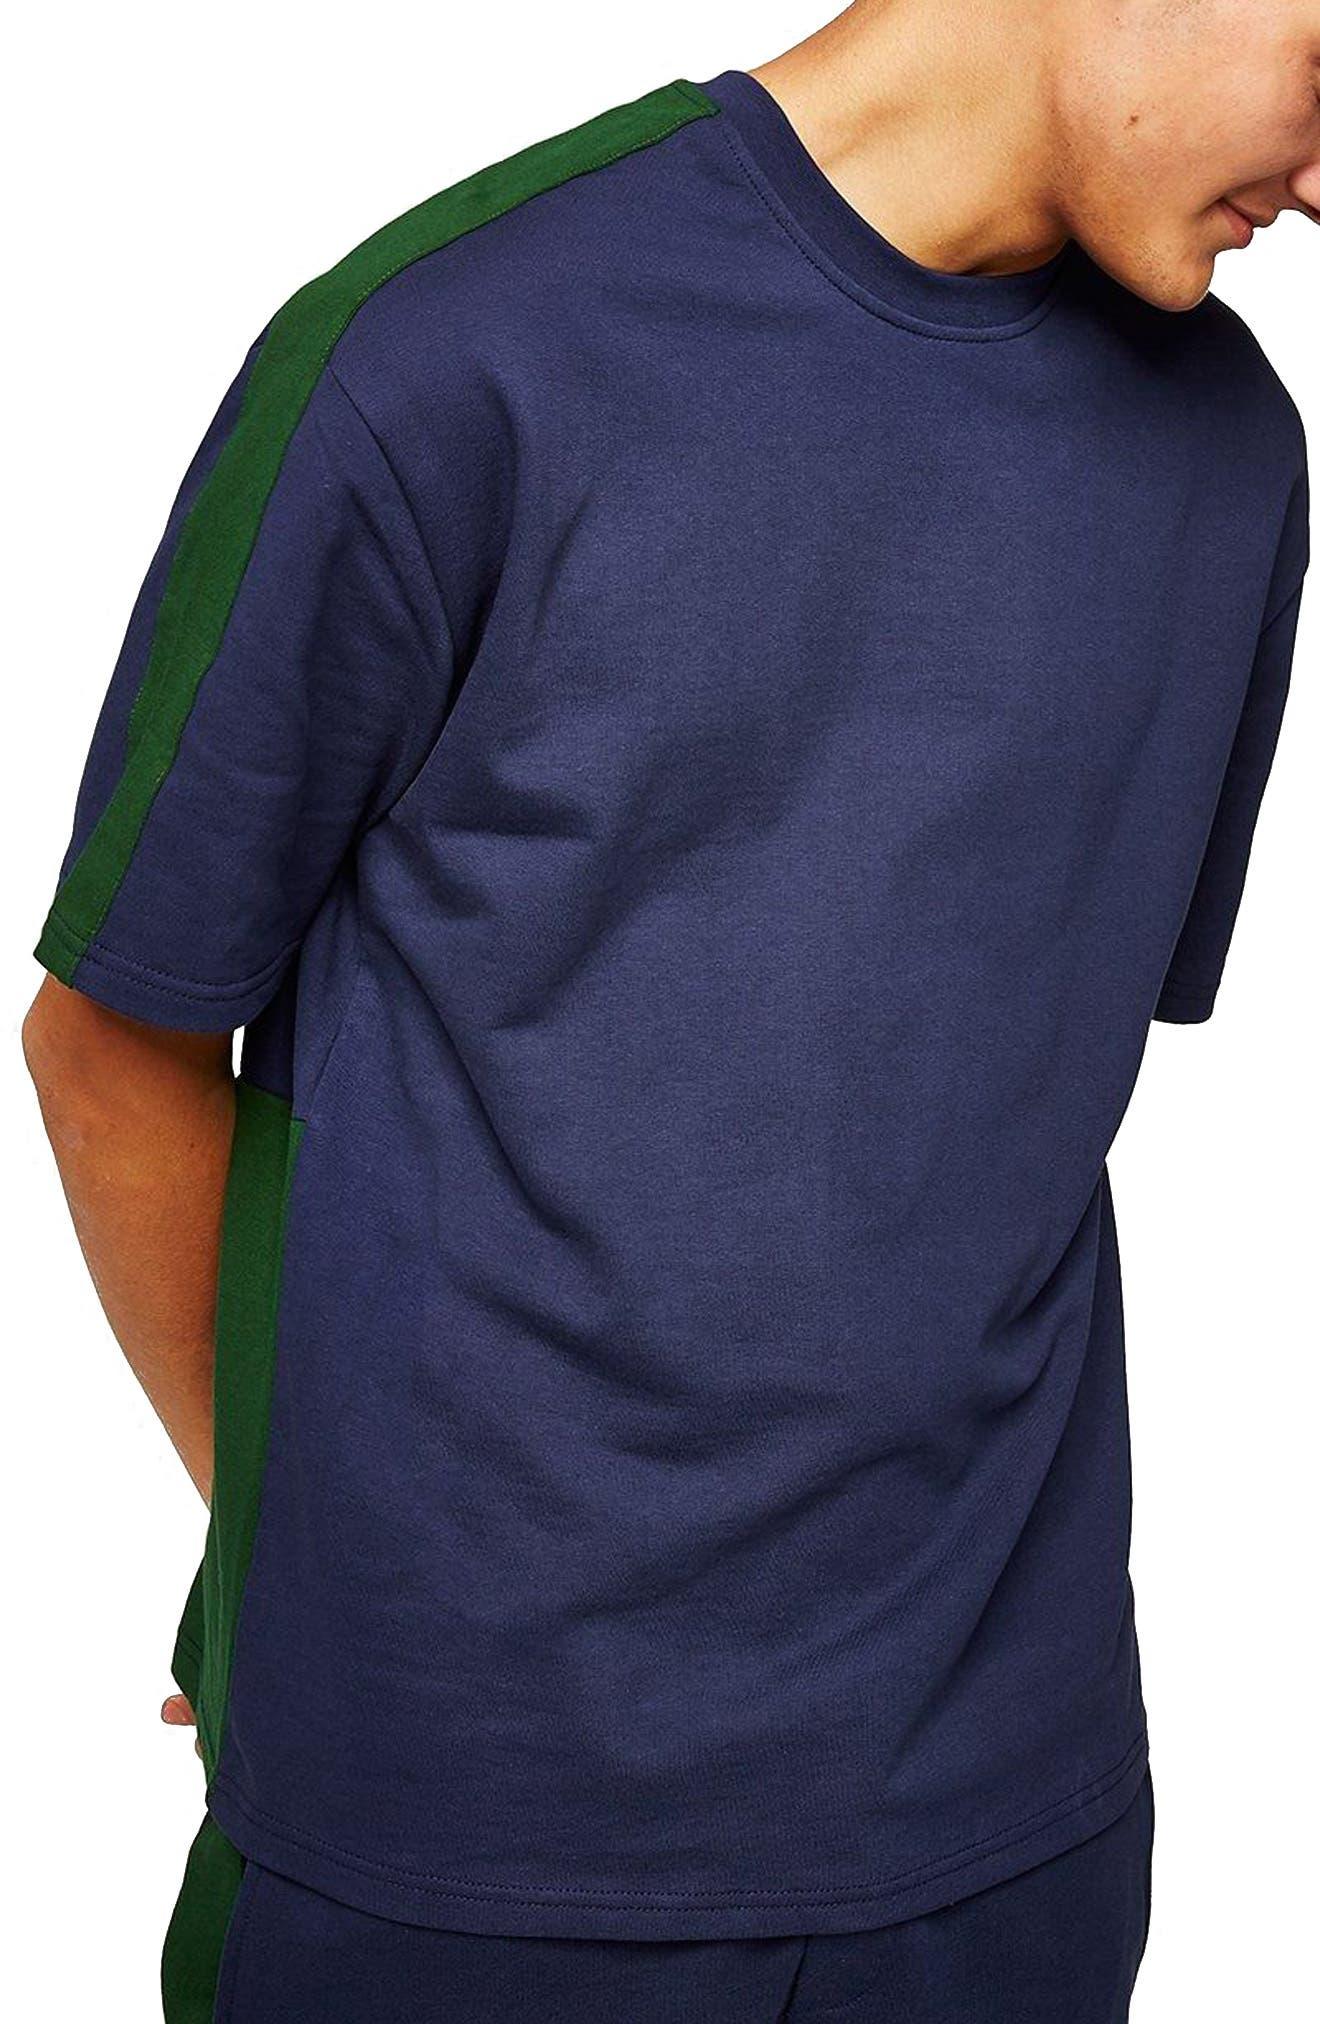 Colorblock Short Sleeve Sweatshirt,                             Main thumbnail 1, color,                             Navy Blue Multi